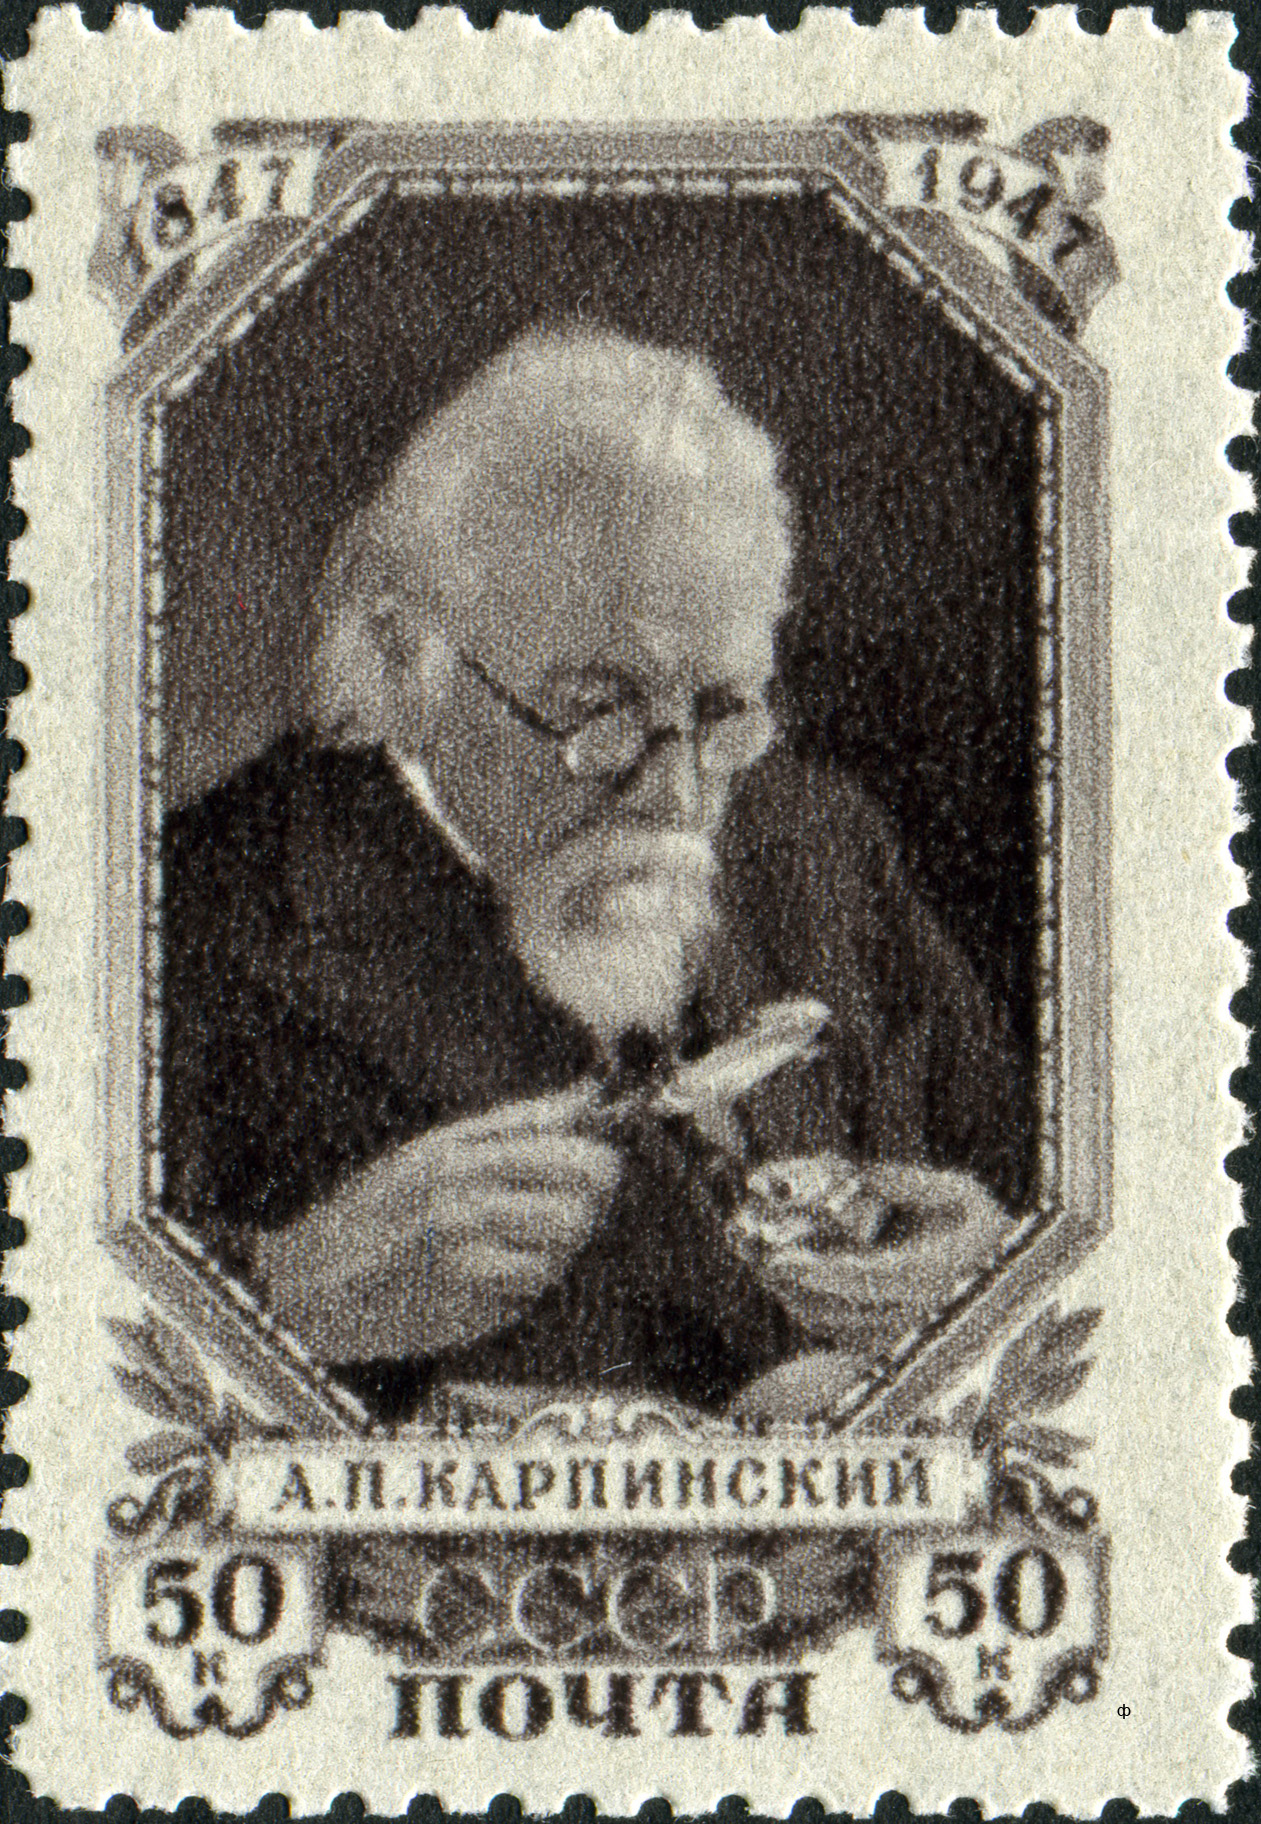 Aleksandr_Petrovich_Karpinsky-USSR-stamp-1947